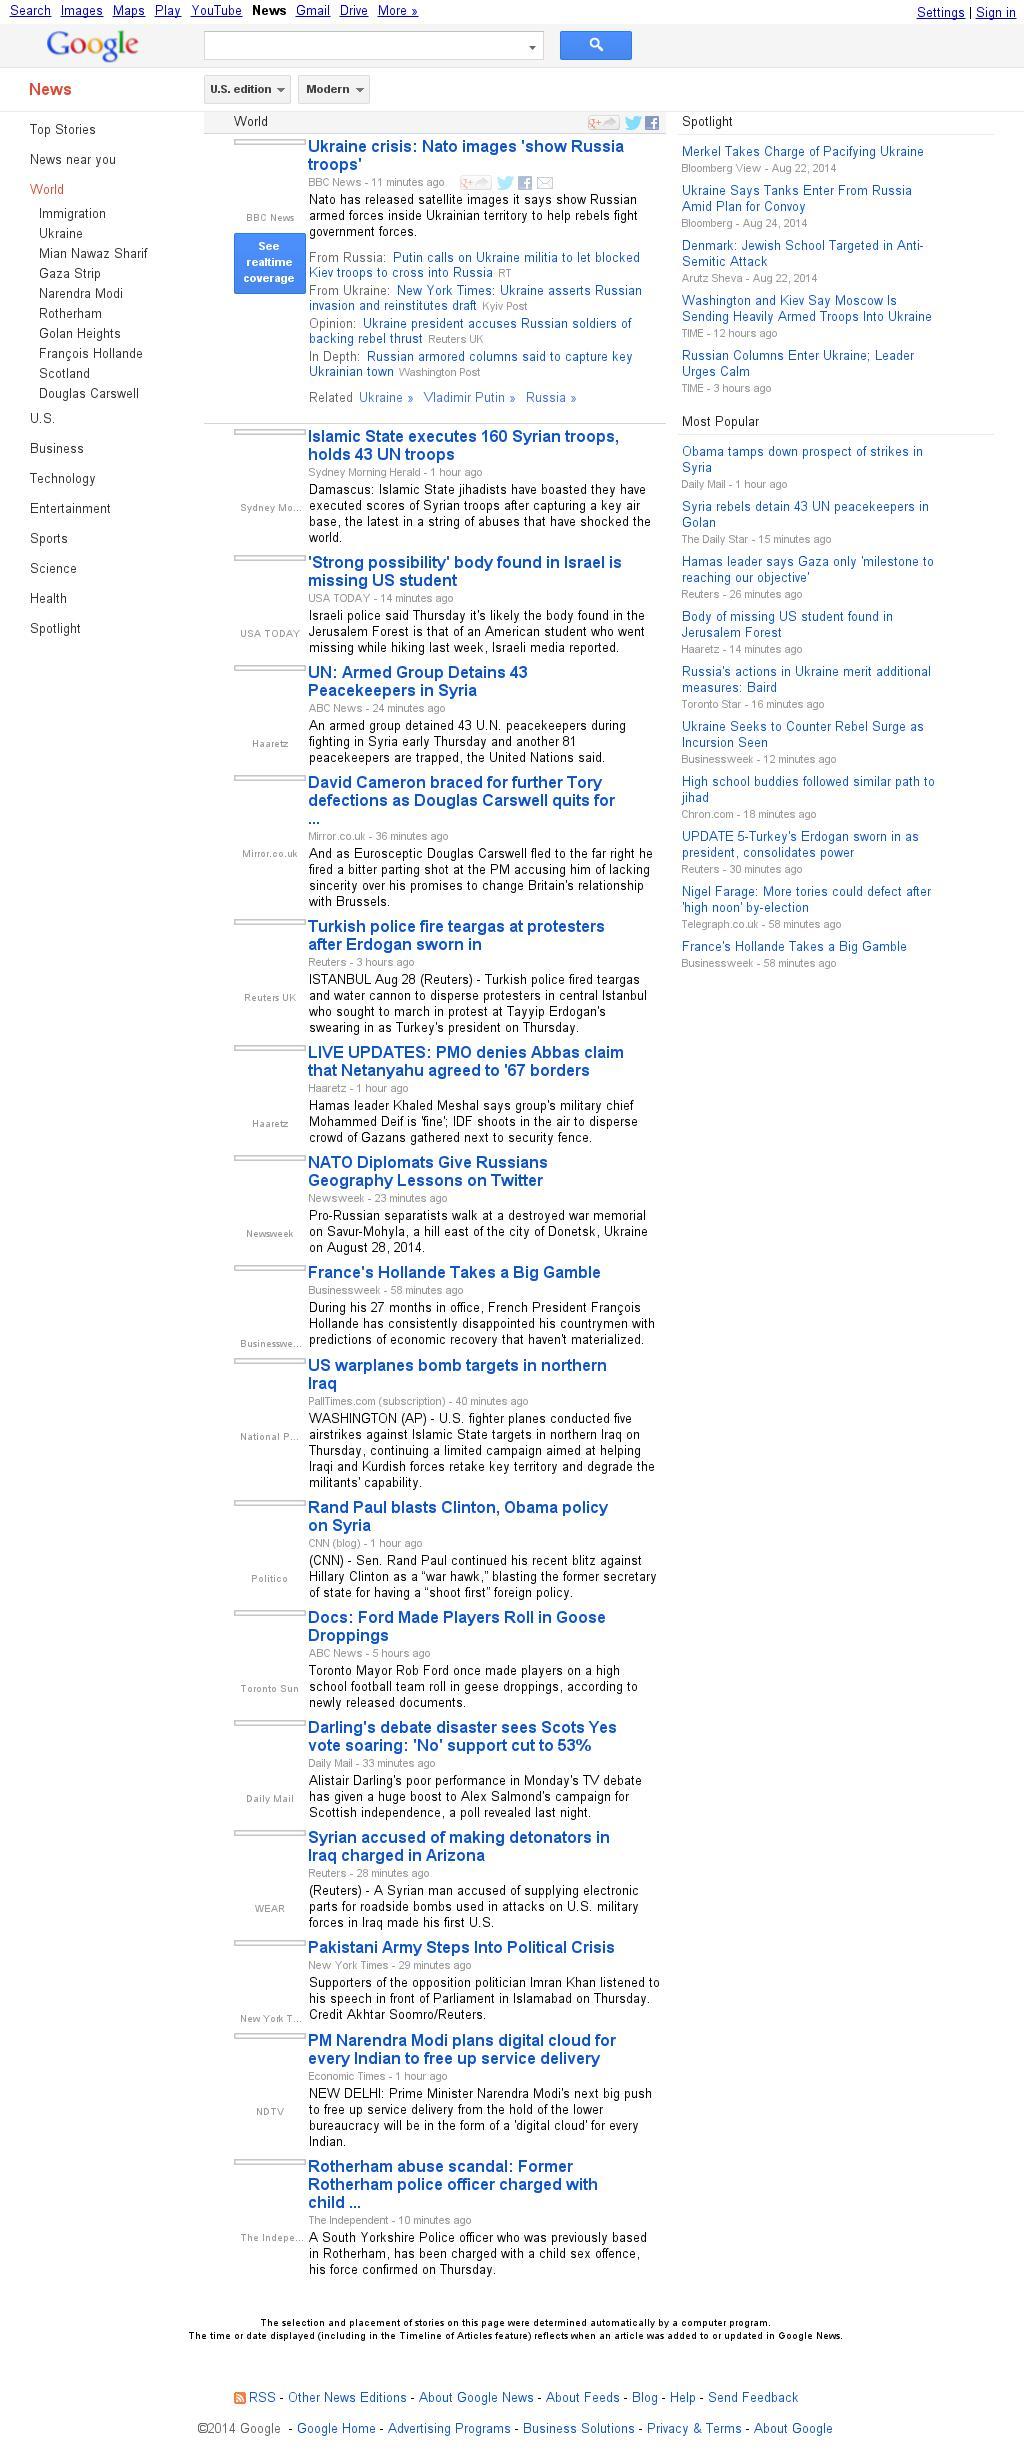 Google News: World at Thursday Aug. 28, 2014, 10:07 p.m. UTC